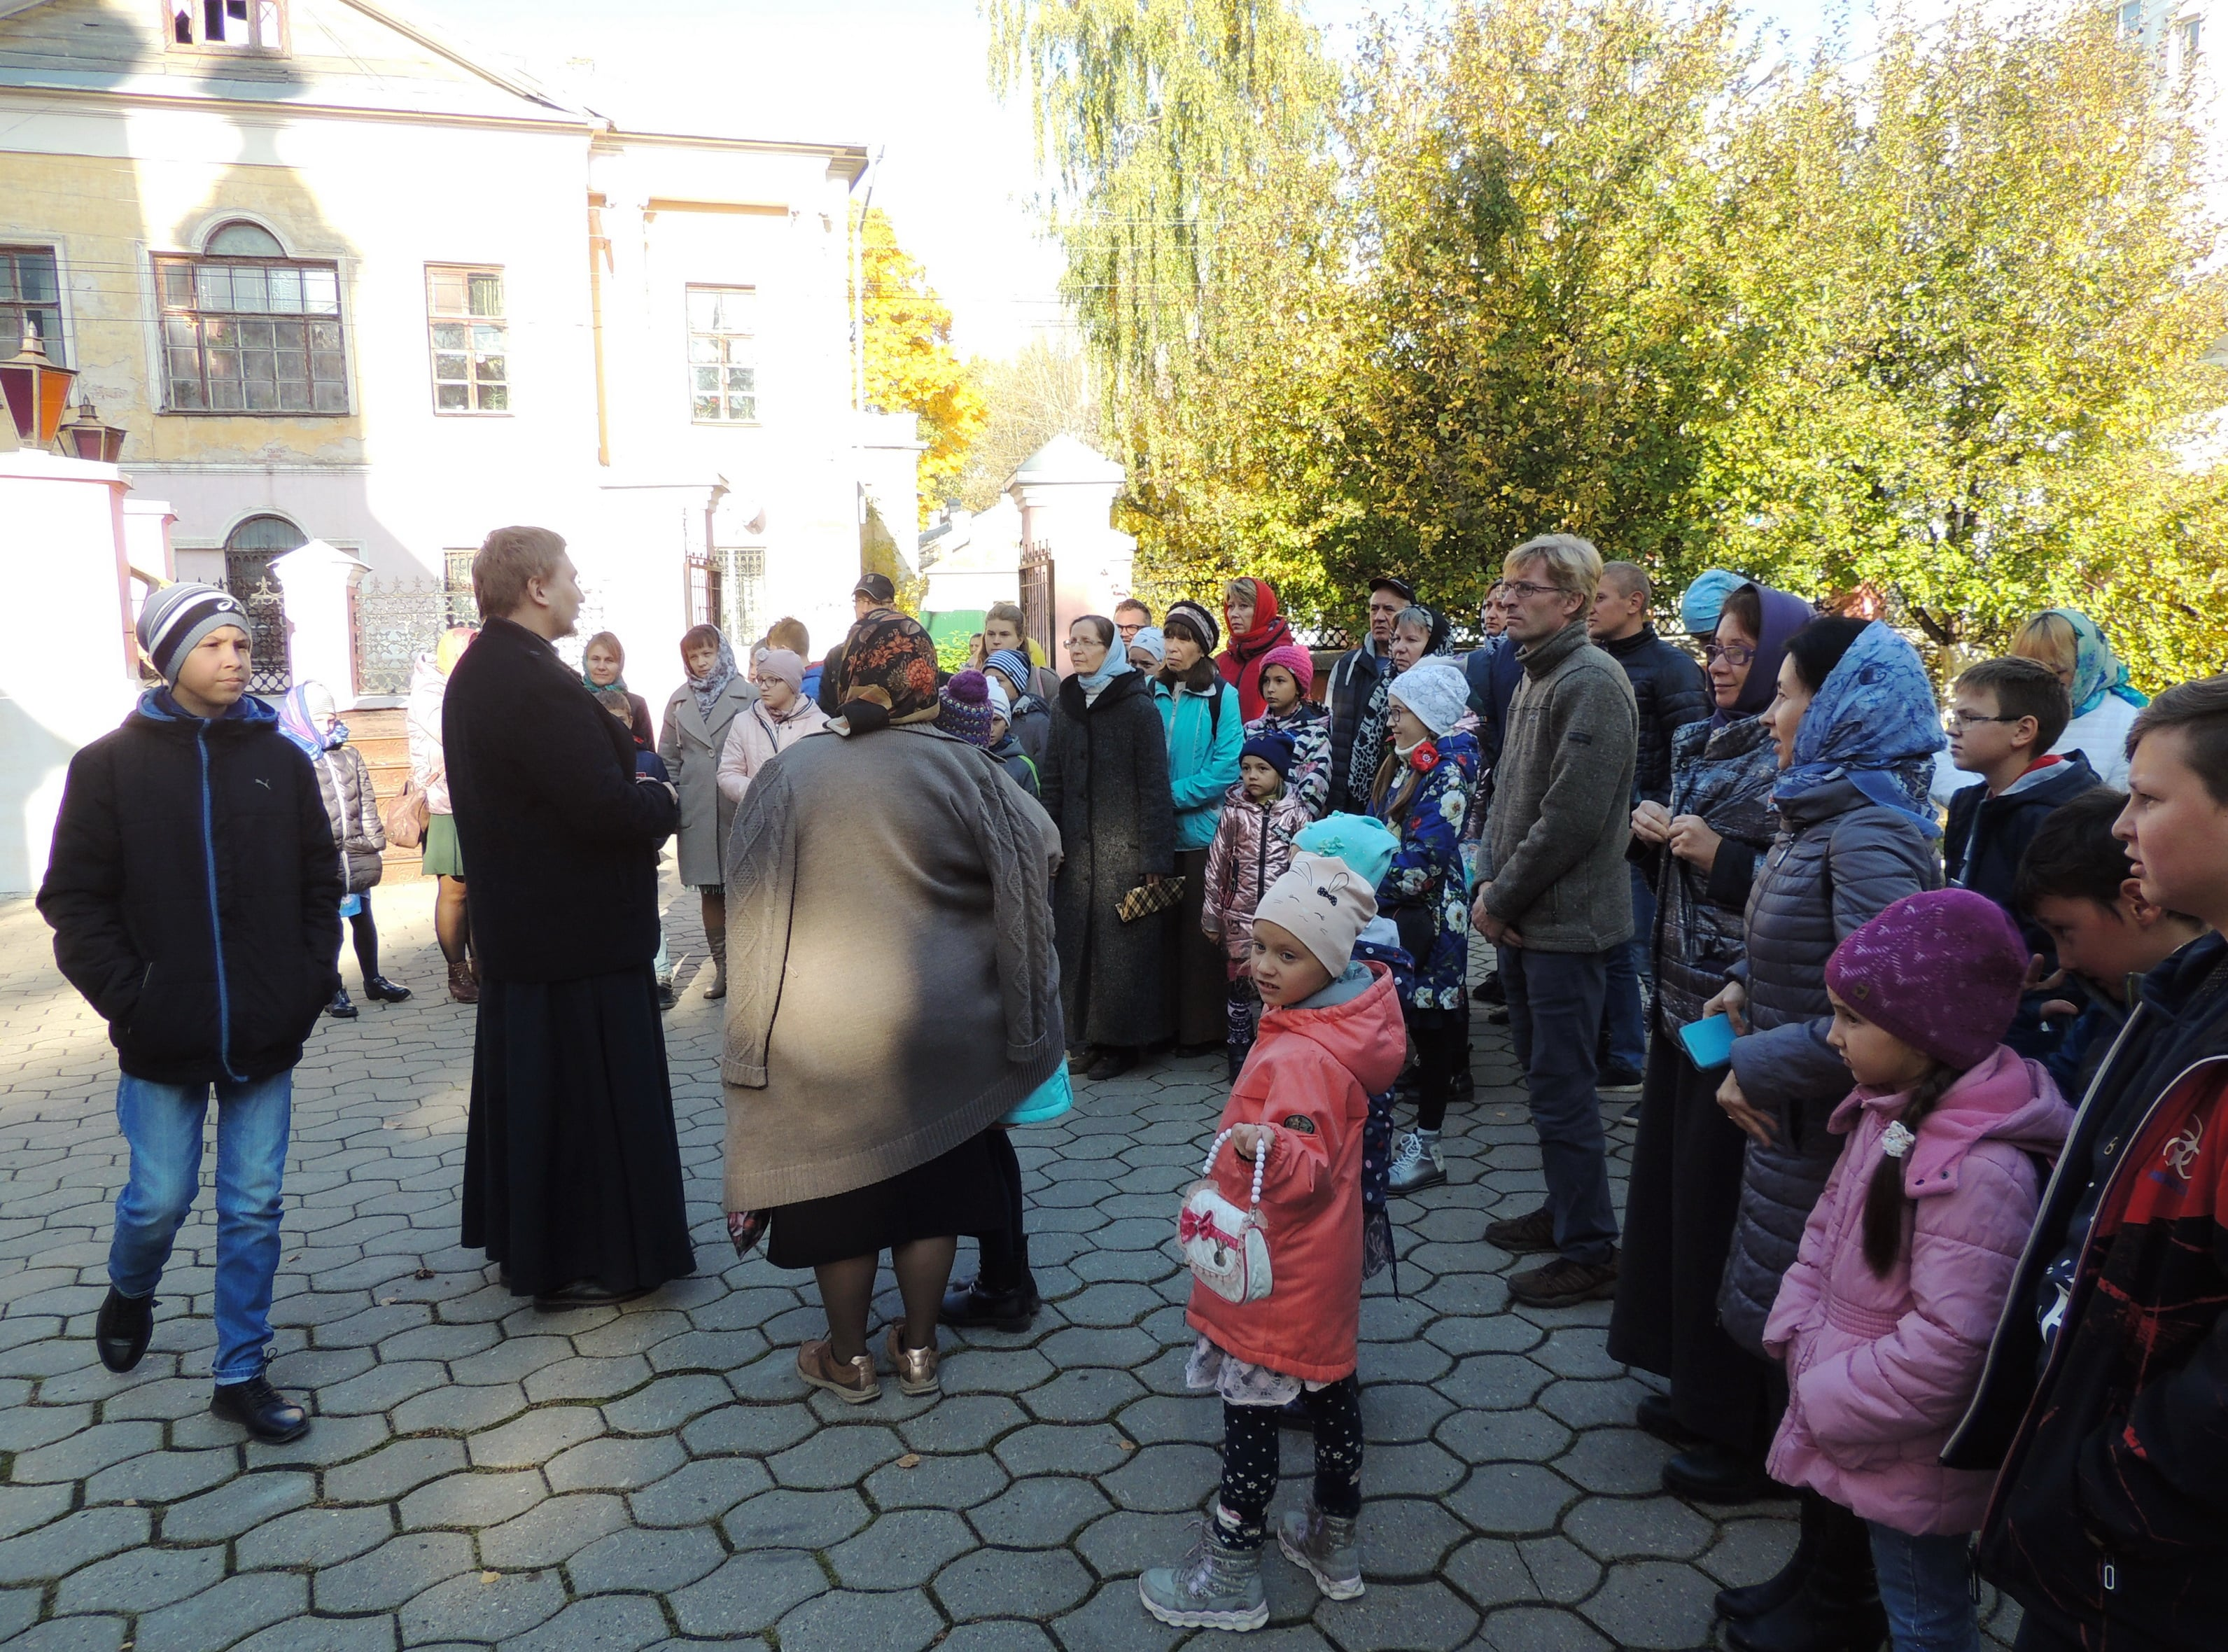 http://monuspen.ru/photoreports/7df66090564ac3621568a9866ab706ae.JPG